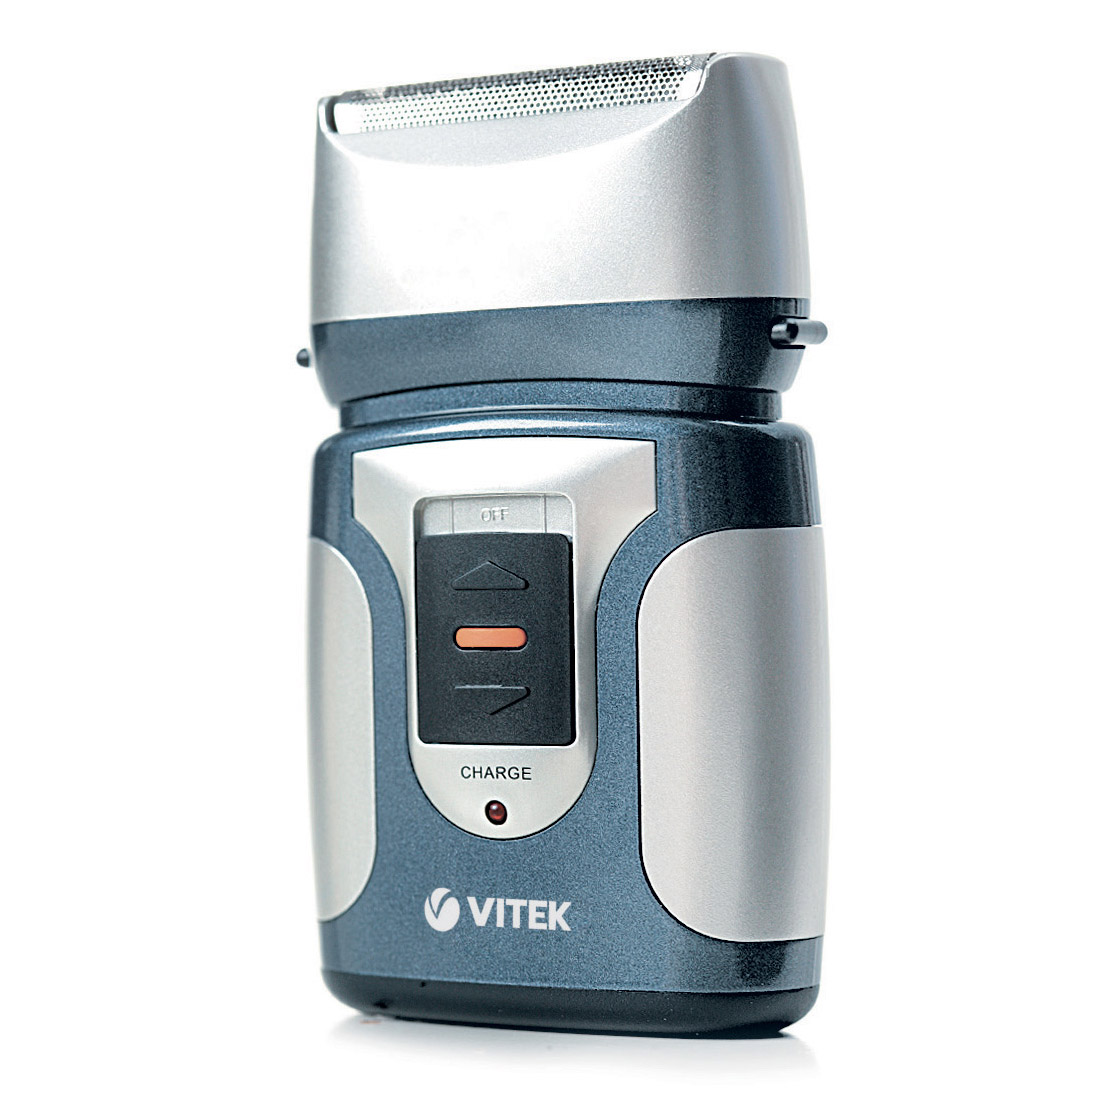 Electric shaver VITEK VT-1372(B) home appliance